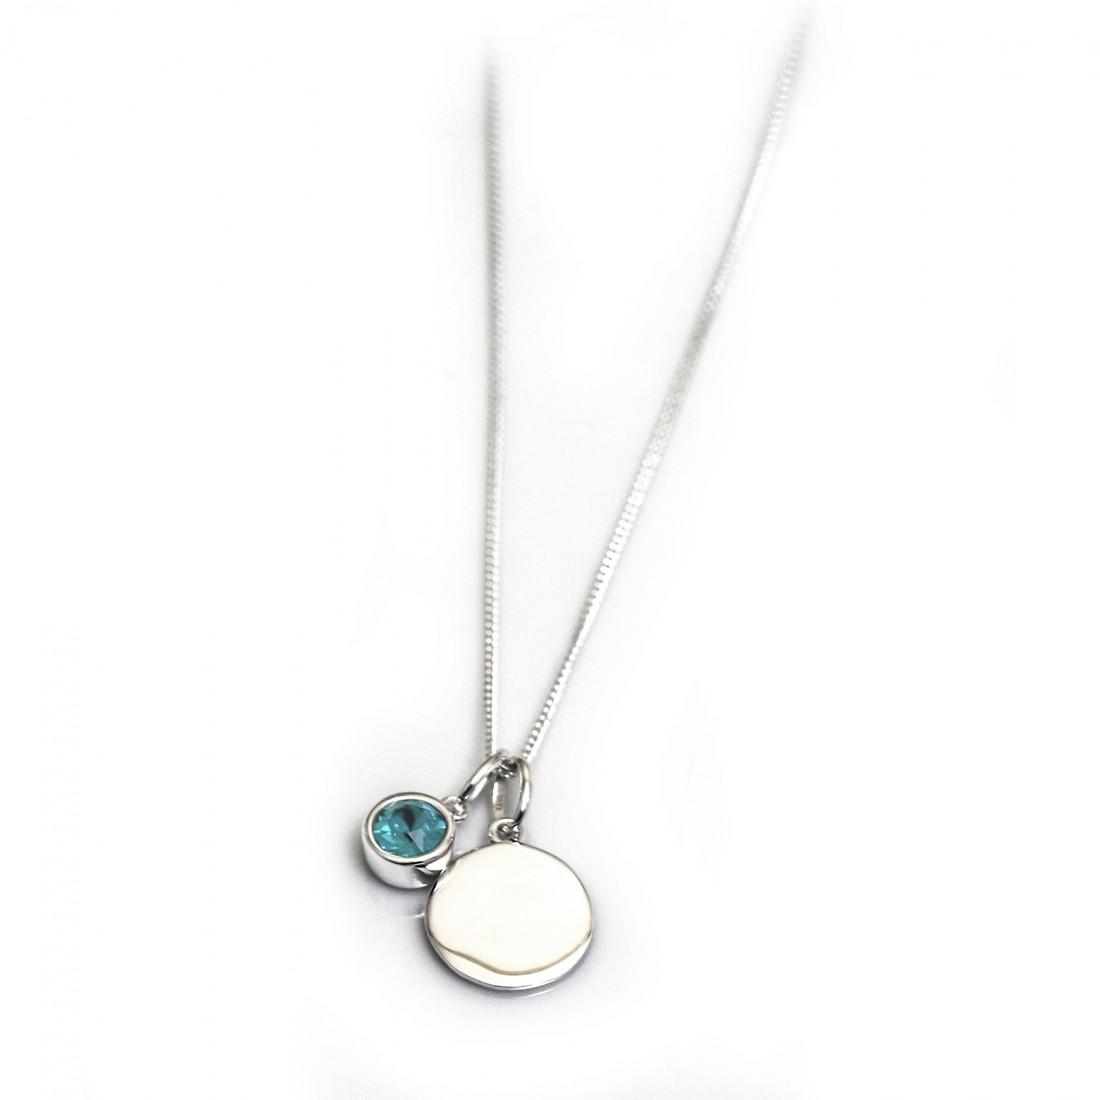 December Birthstone - Blue Zirconia & Silver Disc Necklace